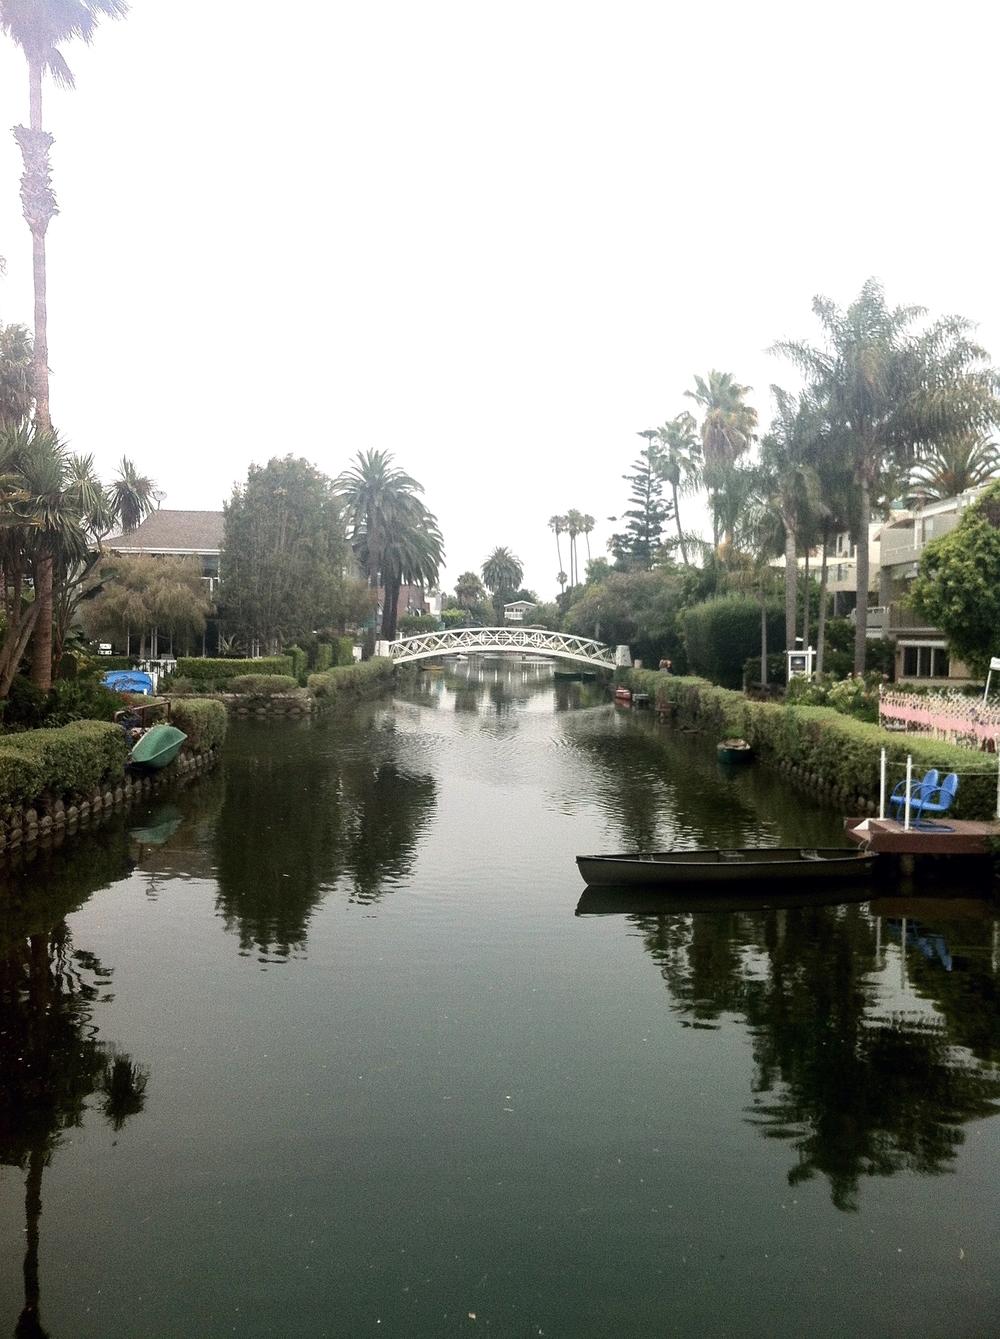 Venice Canals / Venice